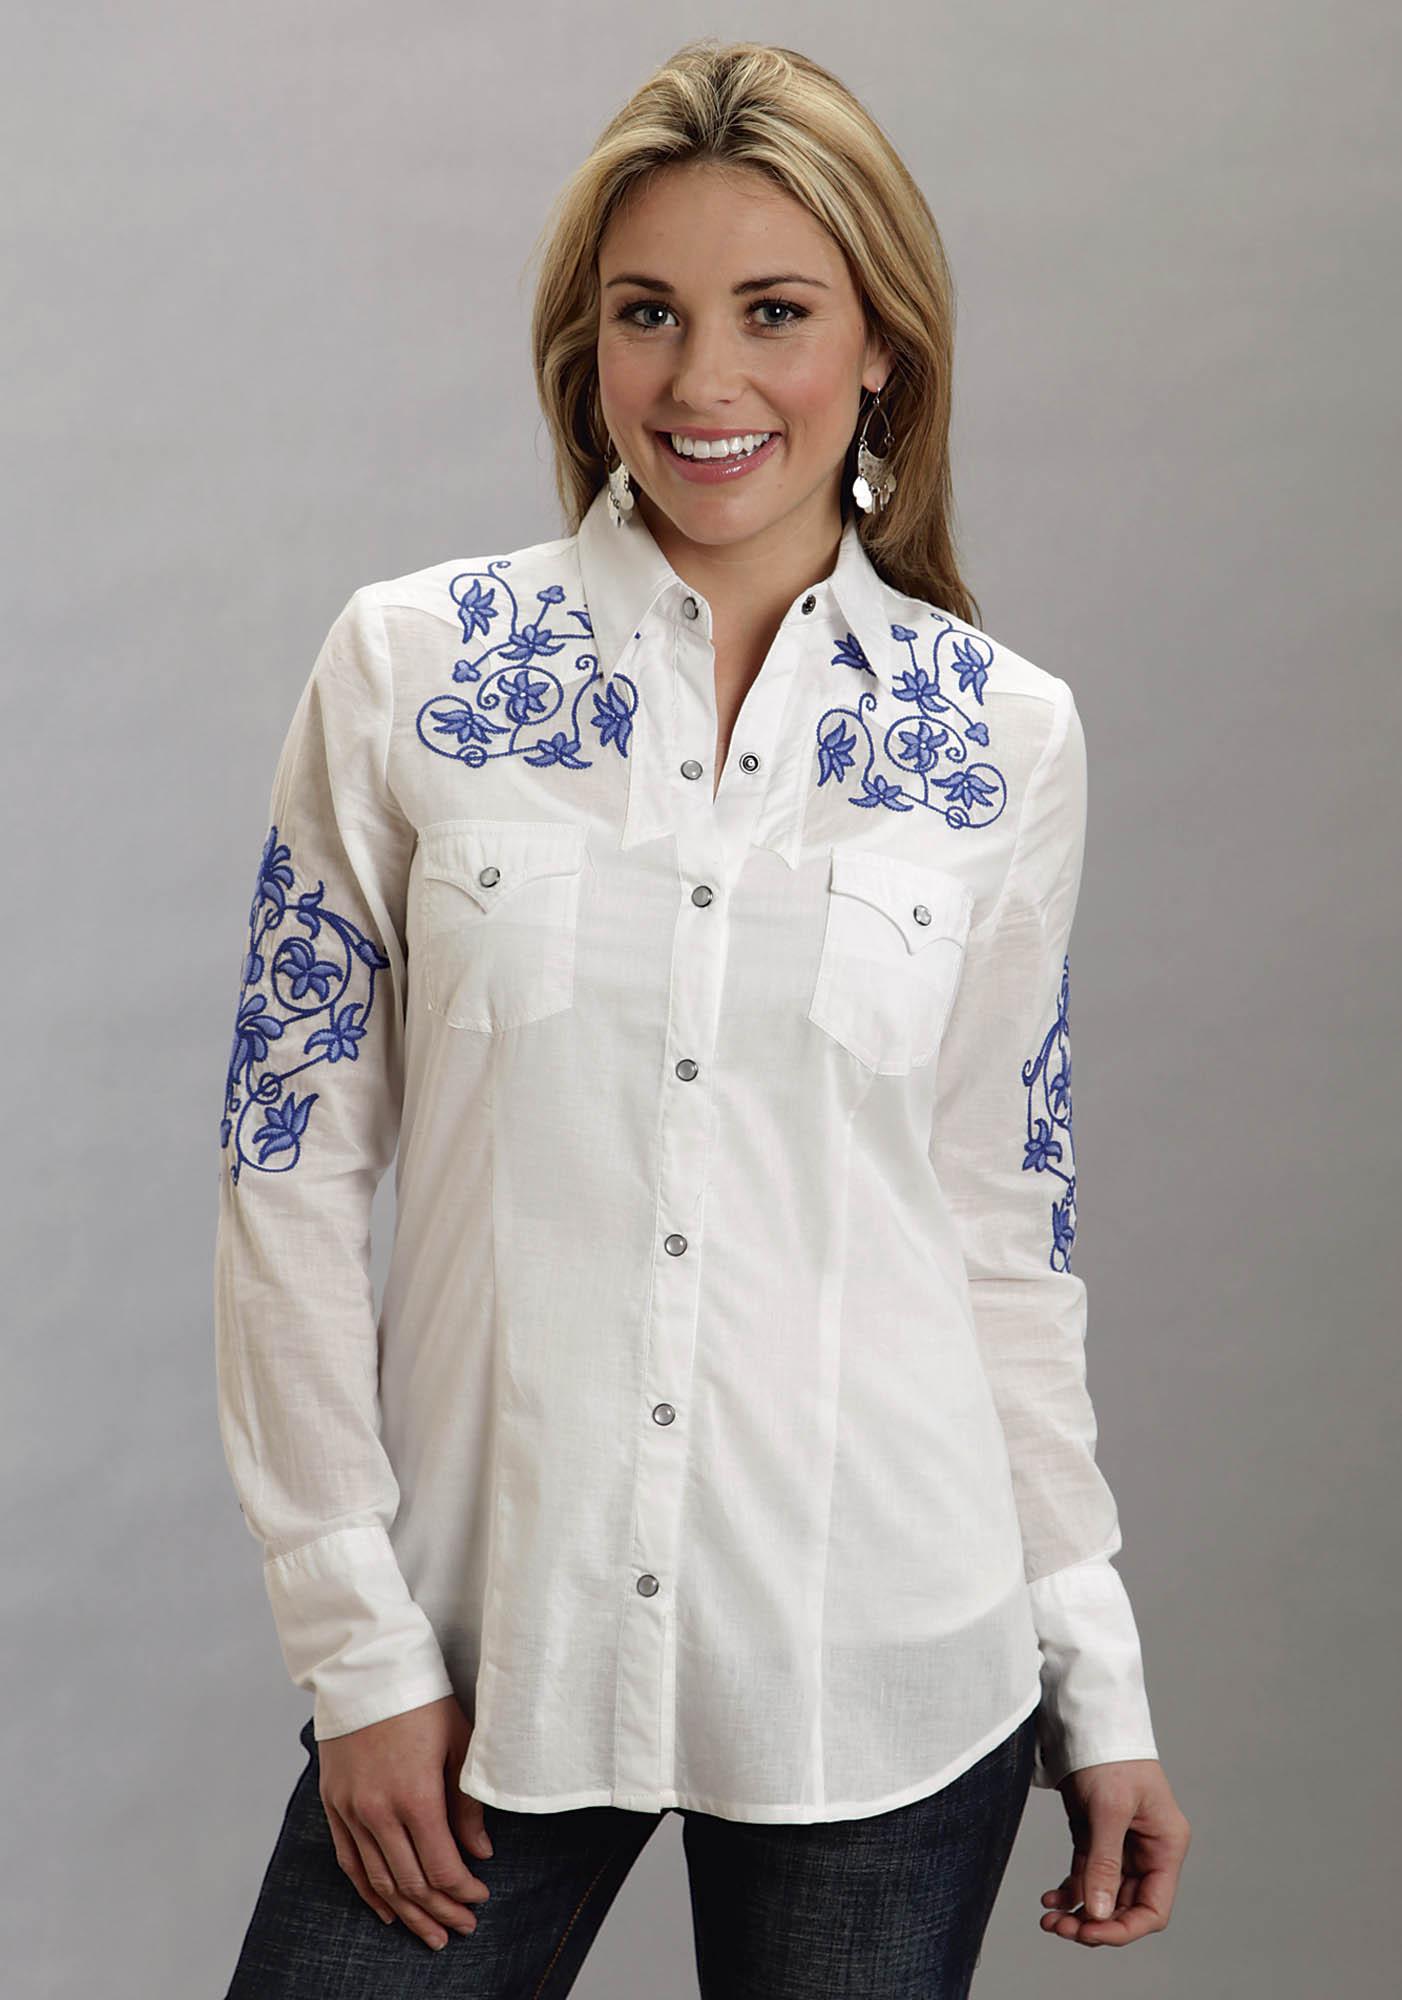 Mens White Short Sleeve Dress Shirt